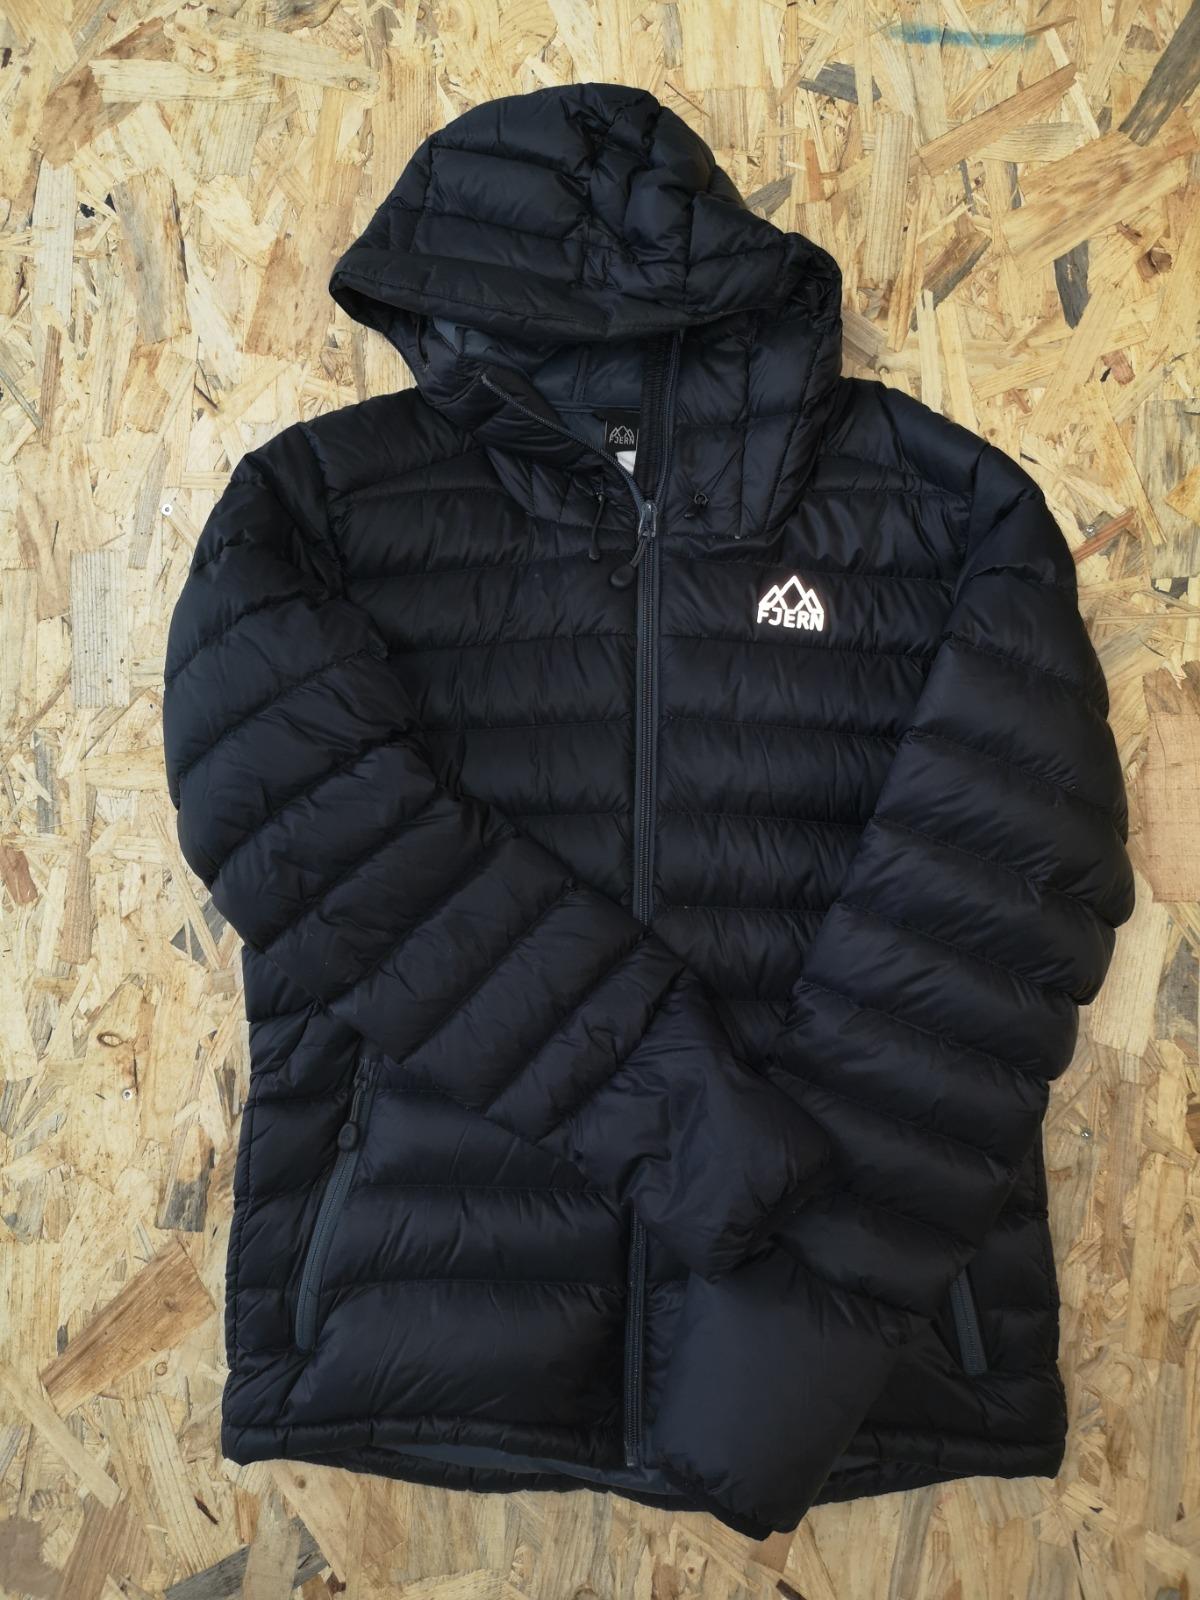 Fjern Down Jacket Black (Medium)